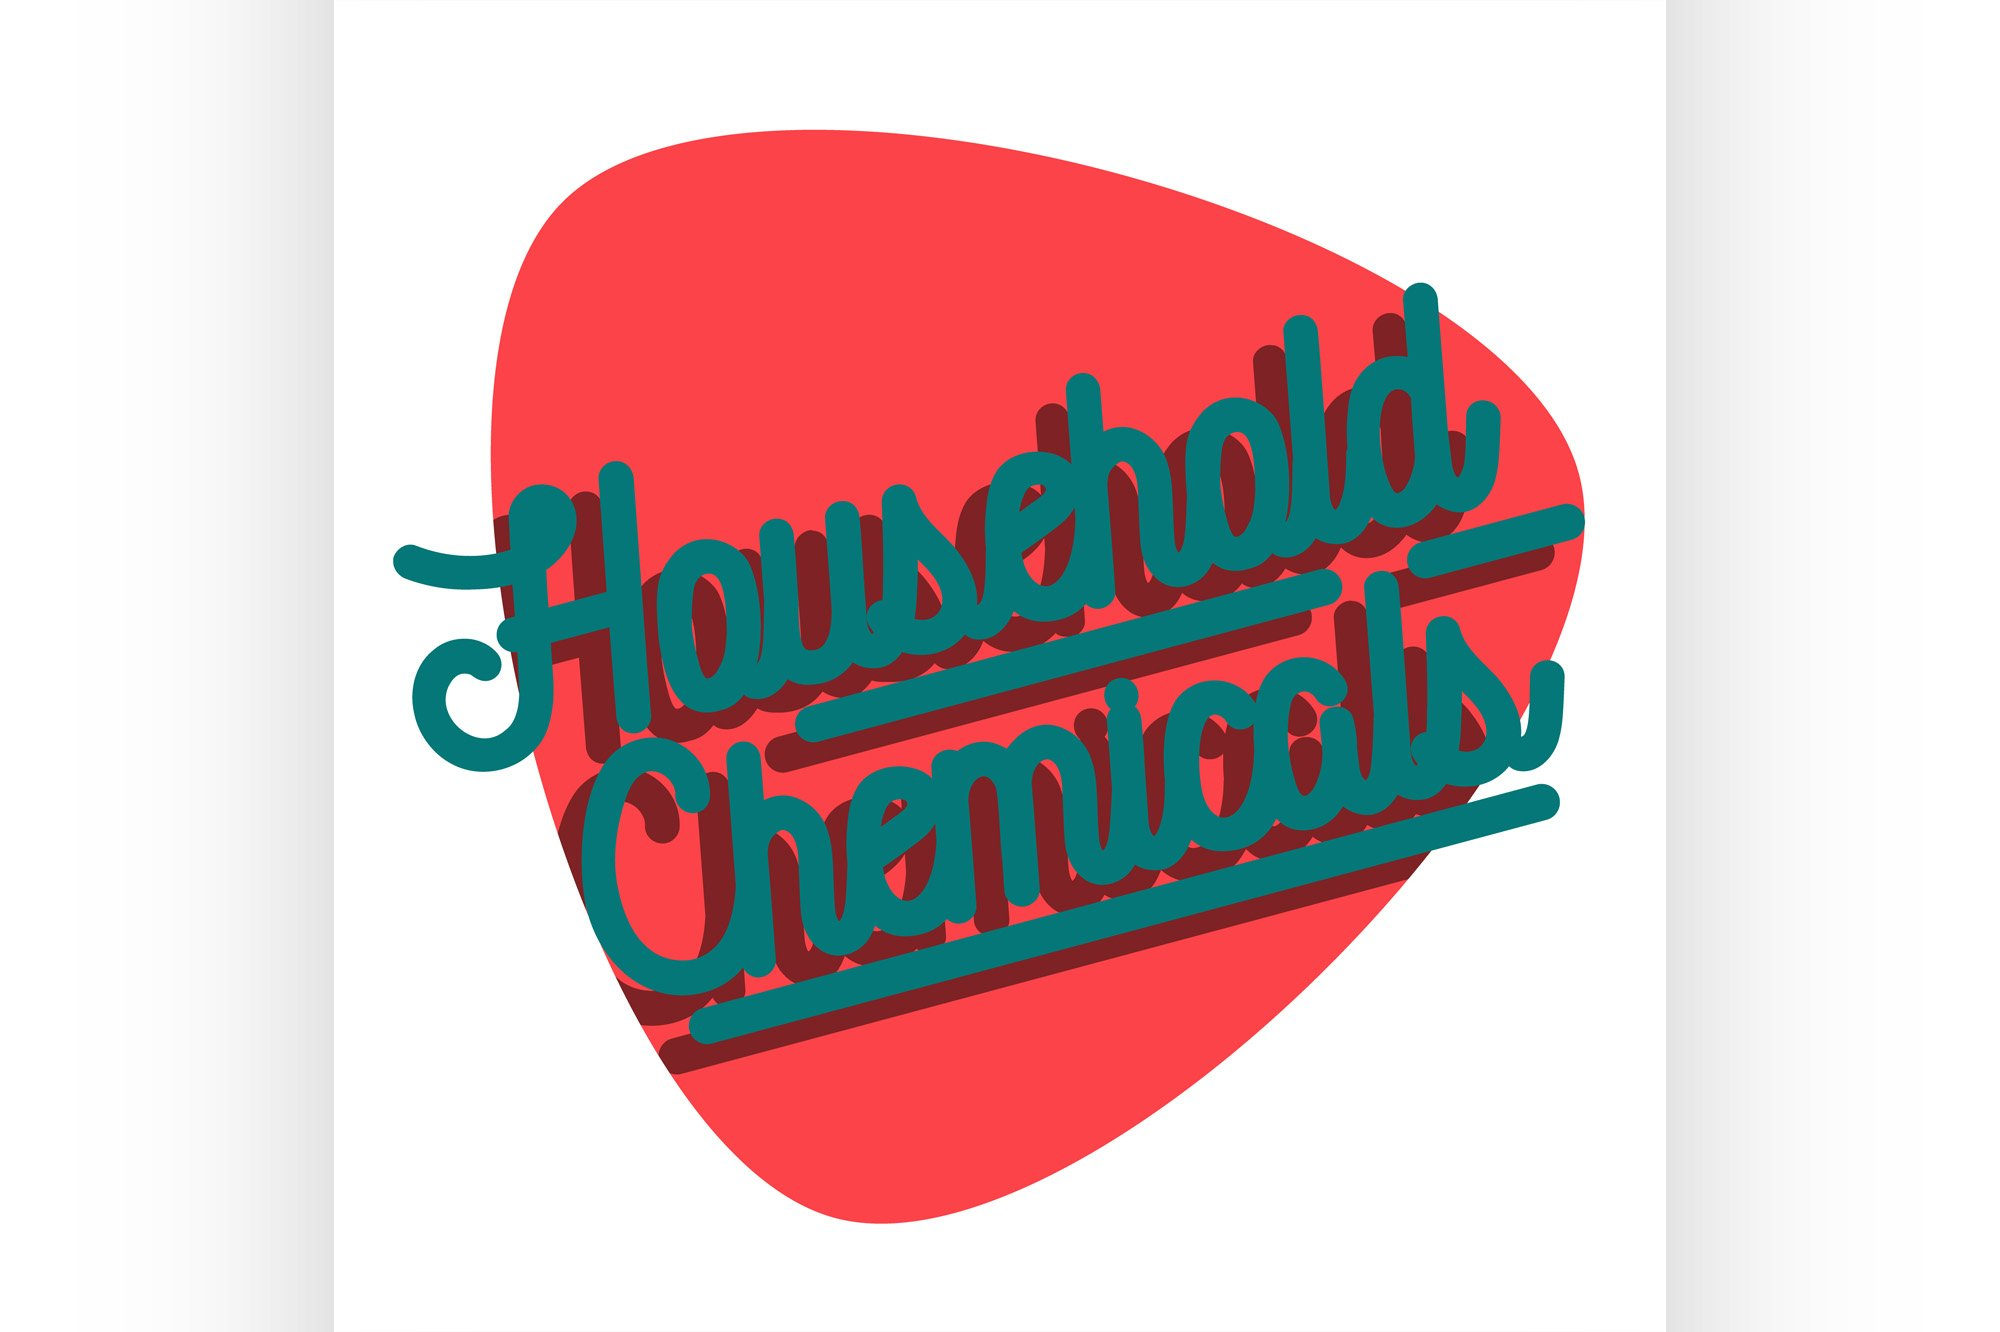 Color vintage household chemicals emblem example image 1